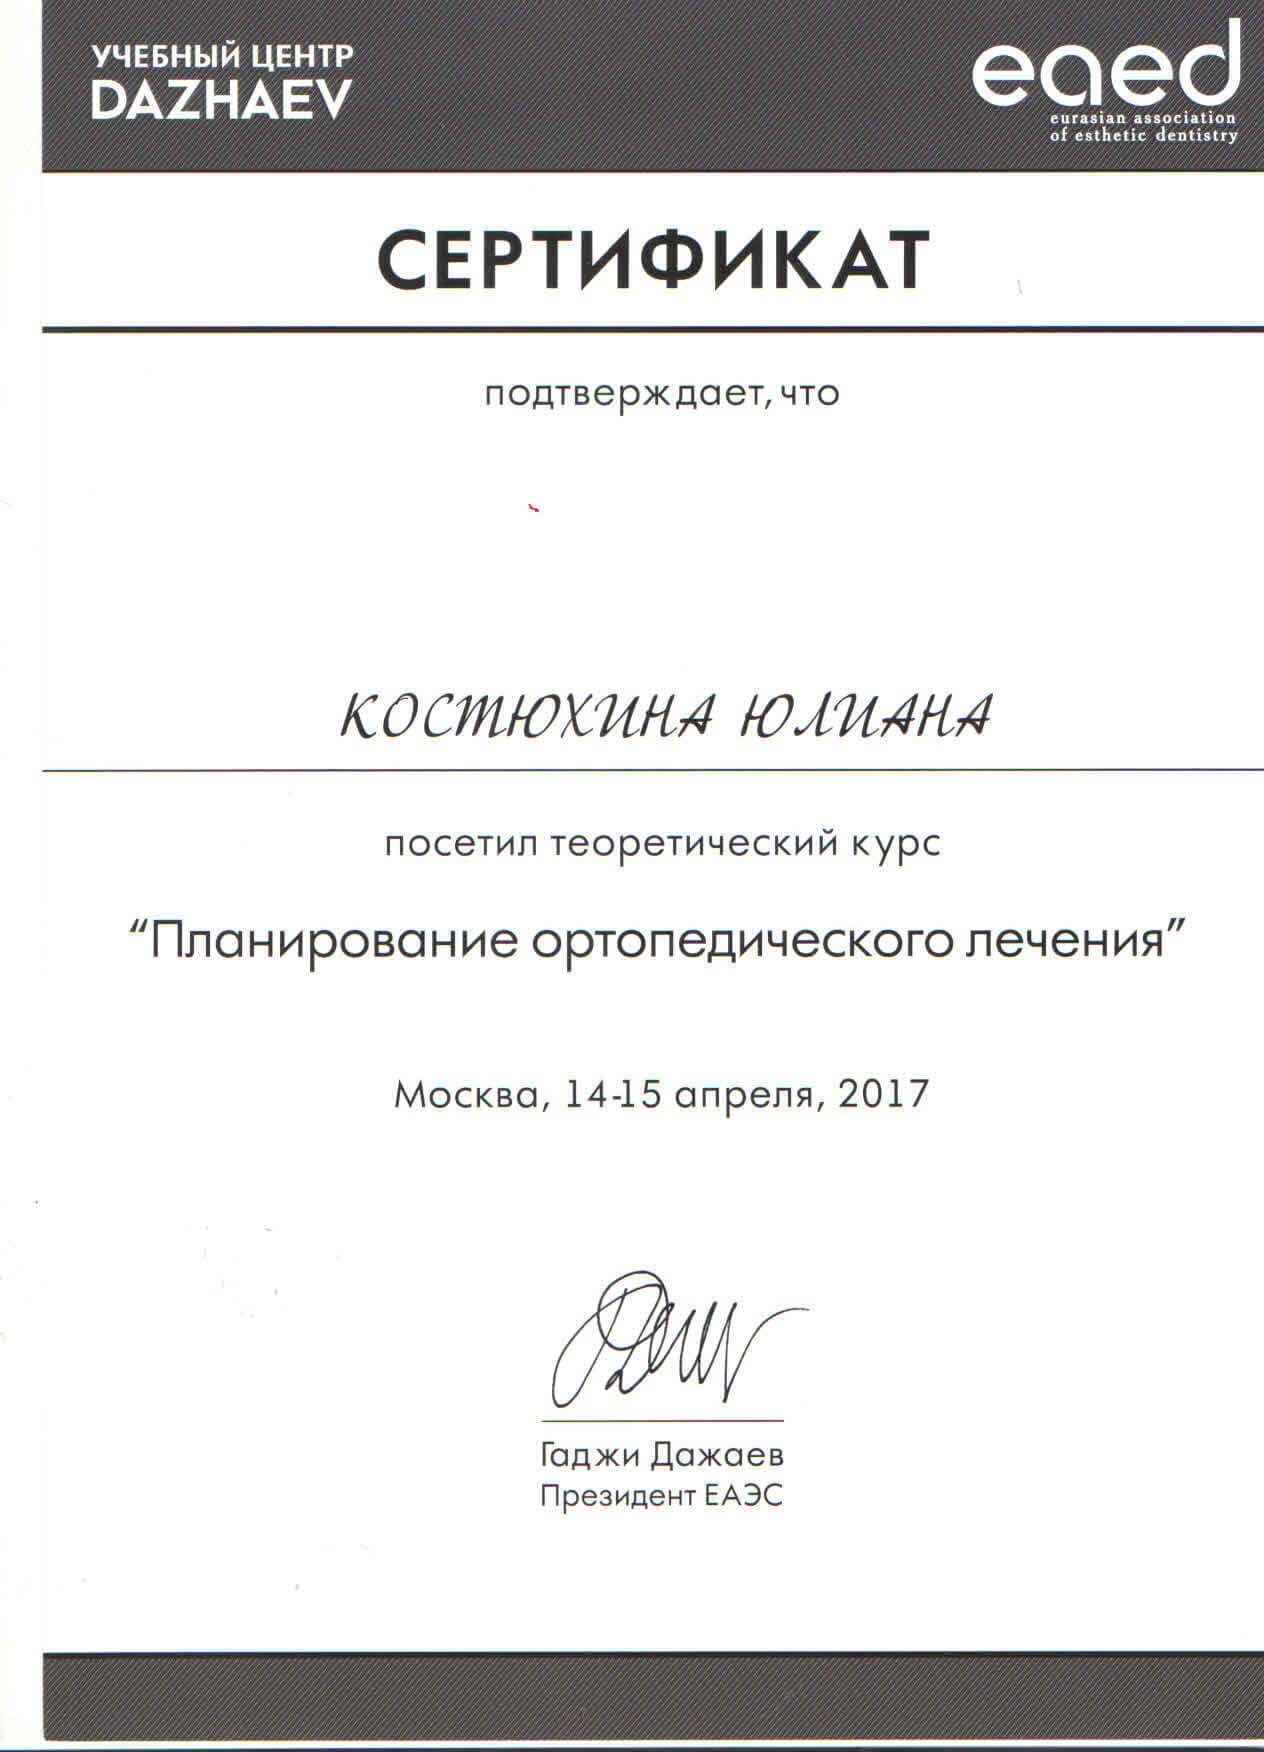 Костюхина Ю.А.5